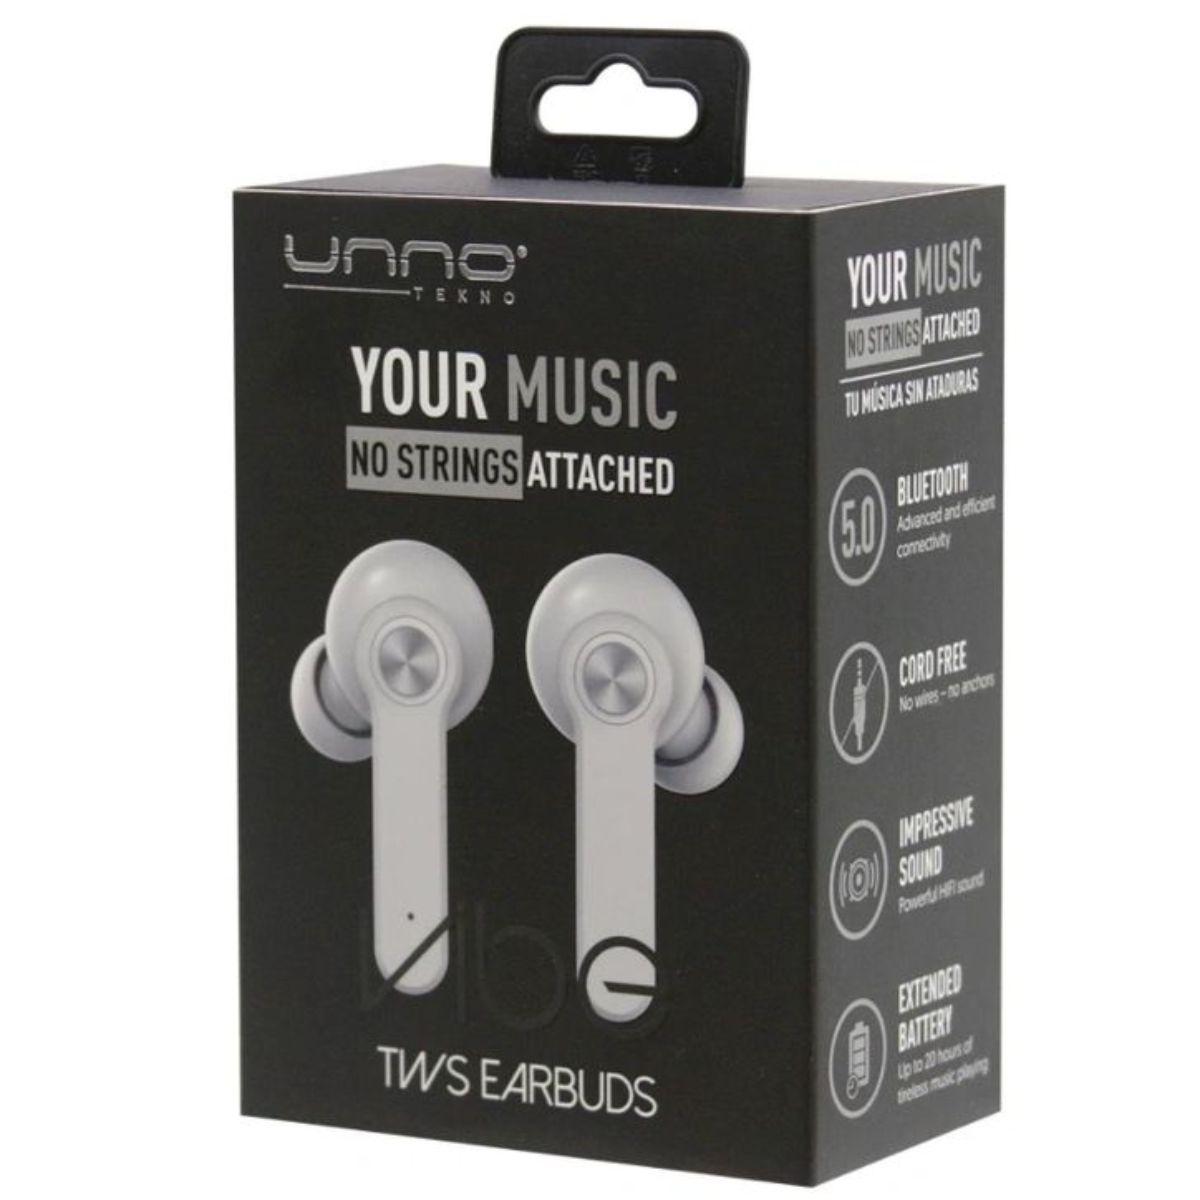 auriculares inalambricos tws vibe 3 1 1